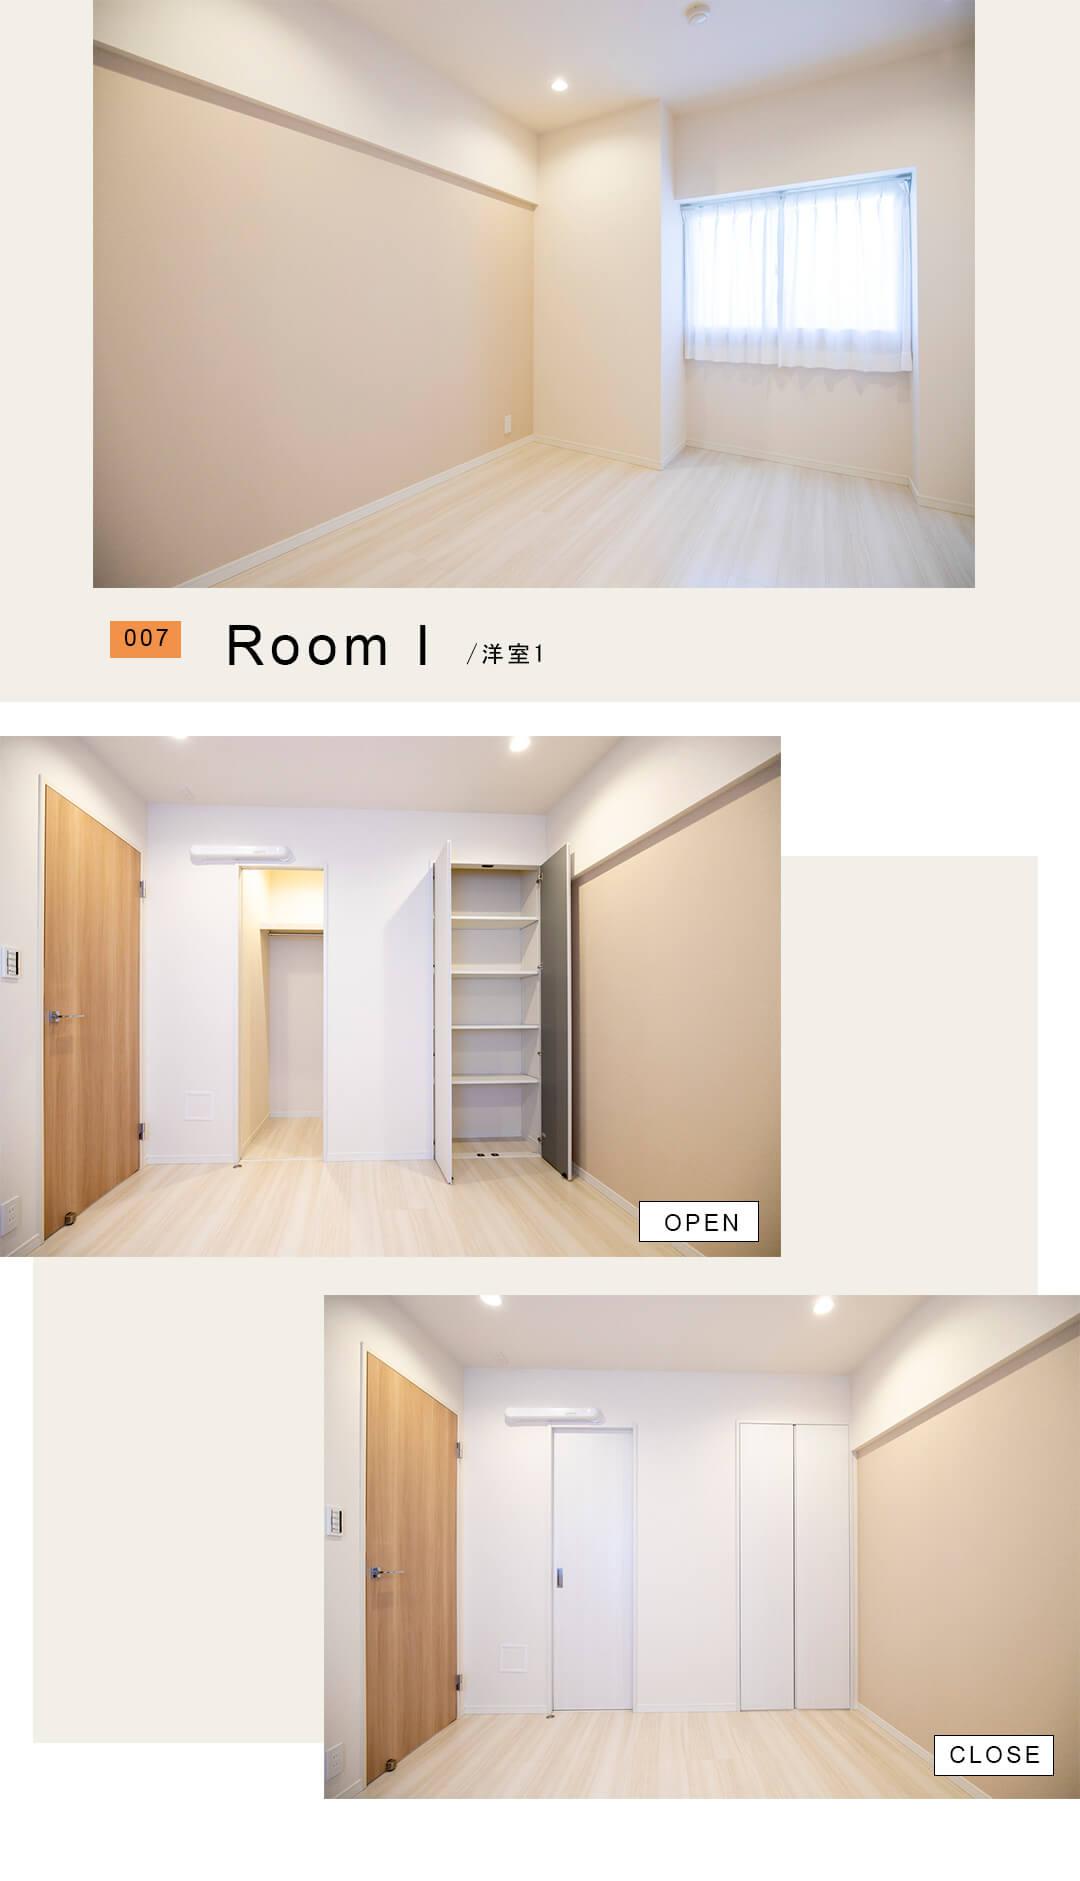 002,RoomI,洋室1